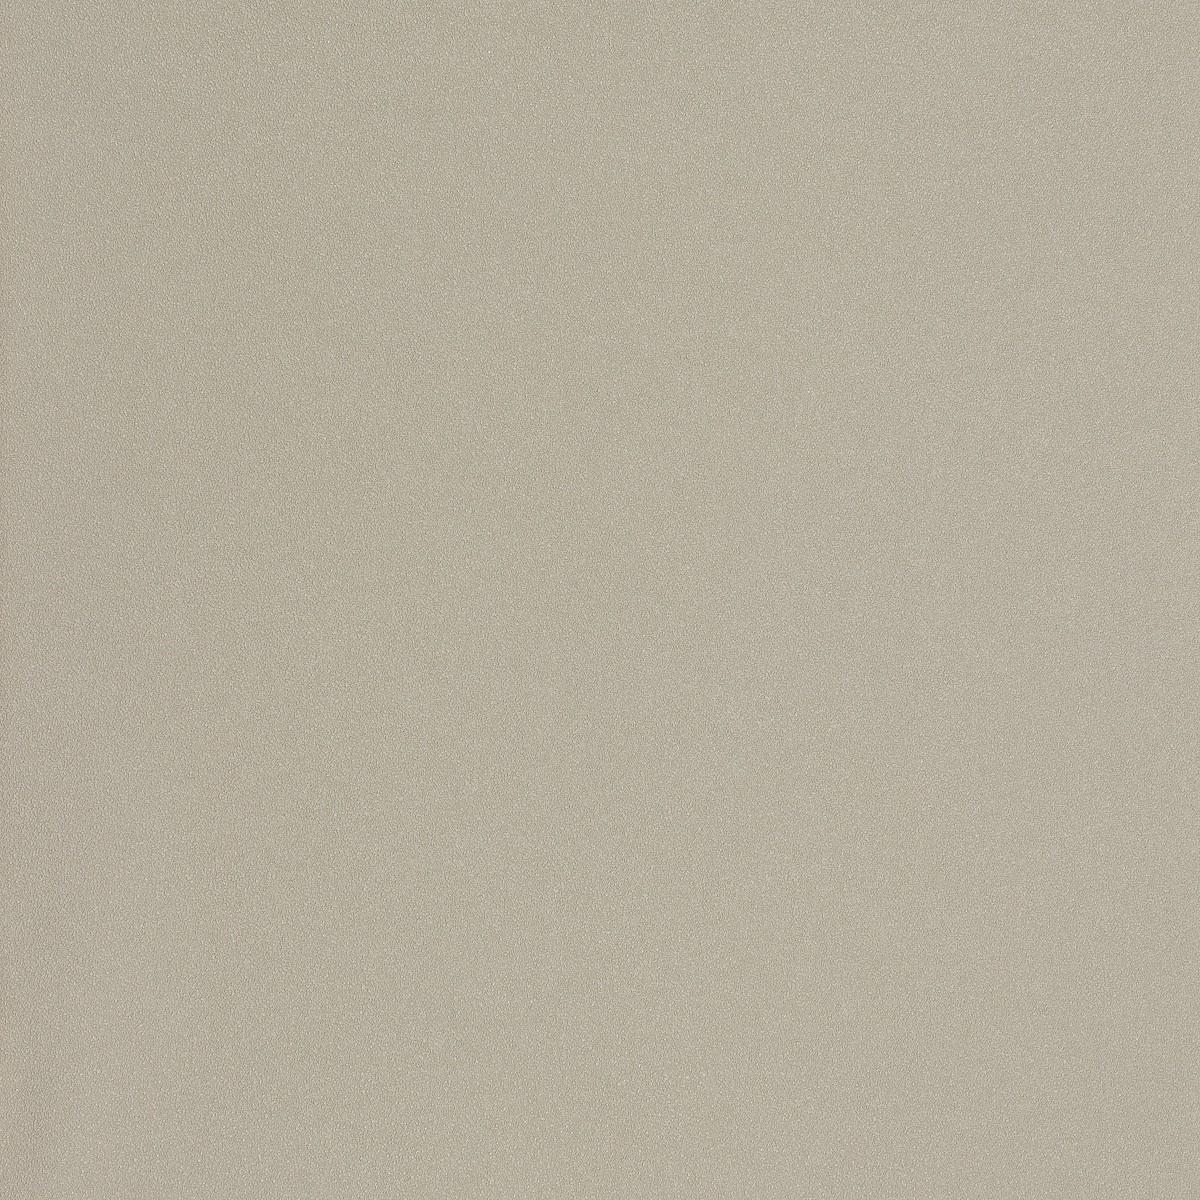 Tapeten grau beige marburg tapeten struktur design for Tapeten struktur design